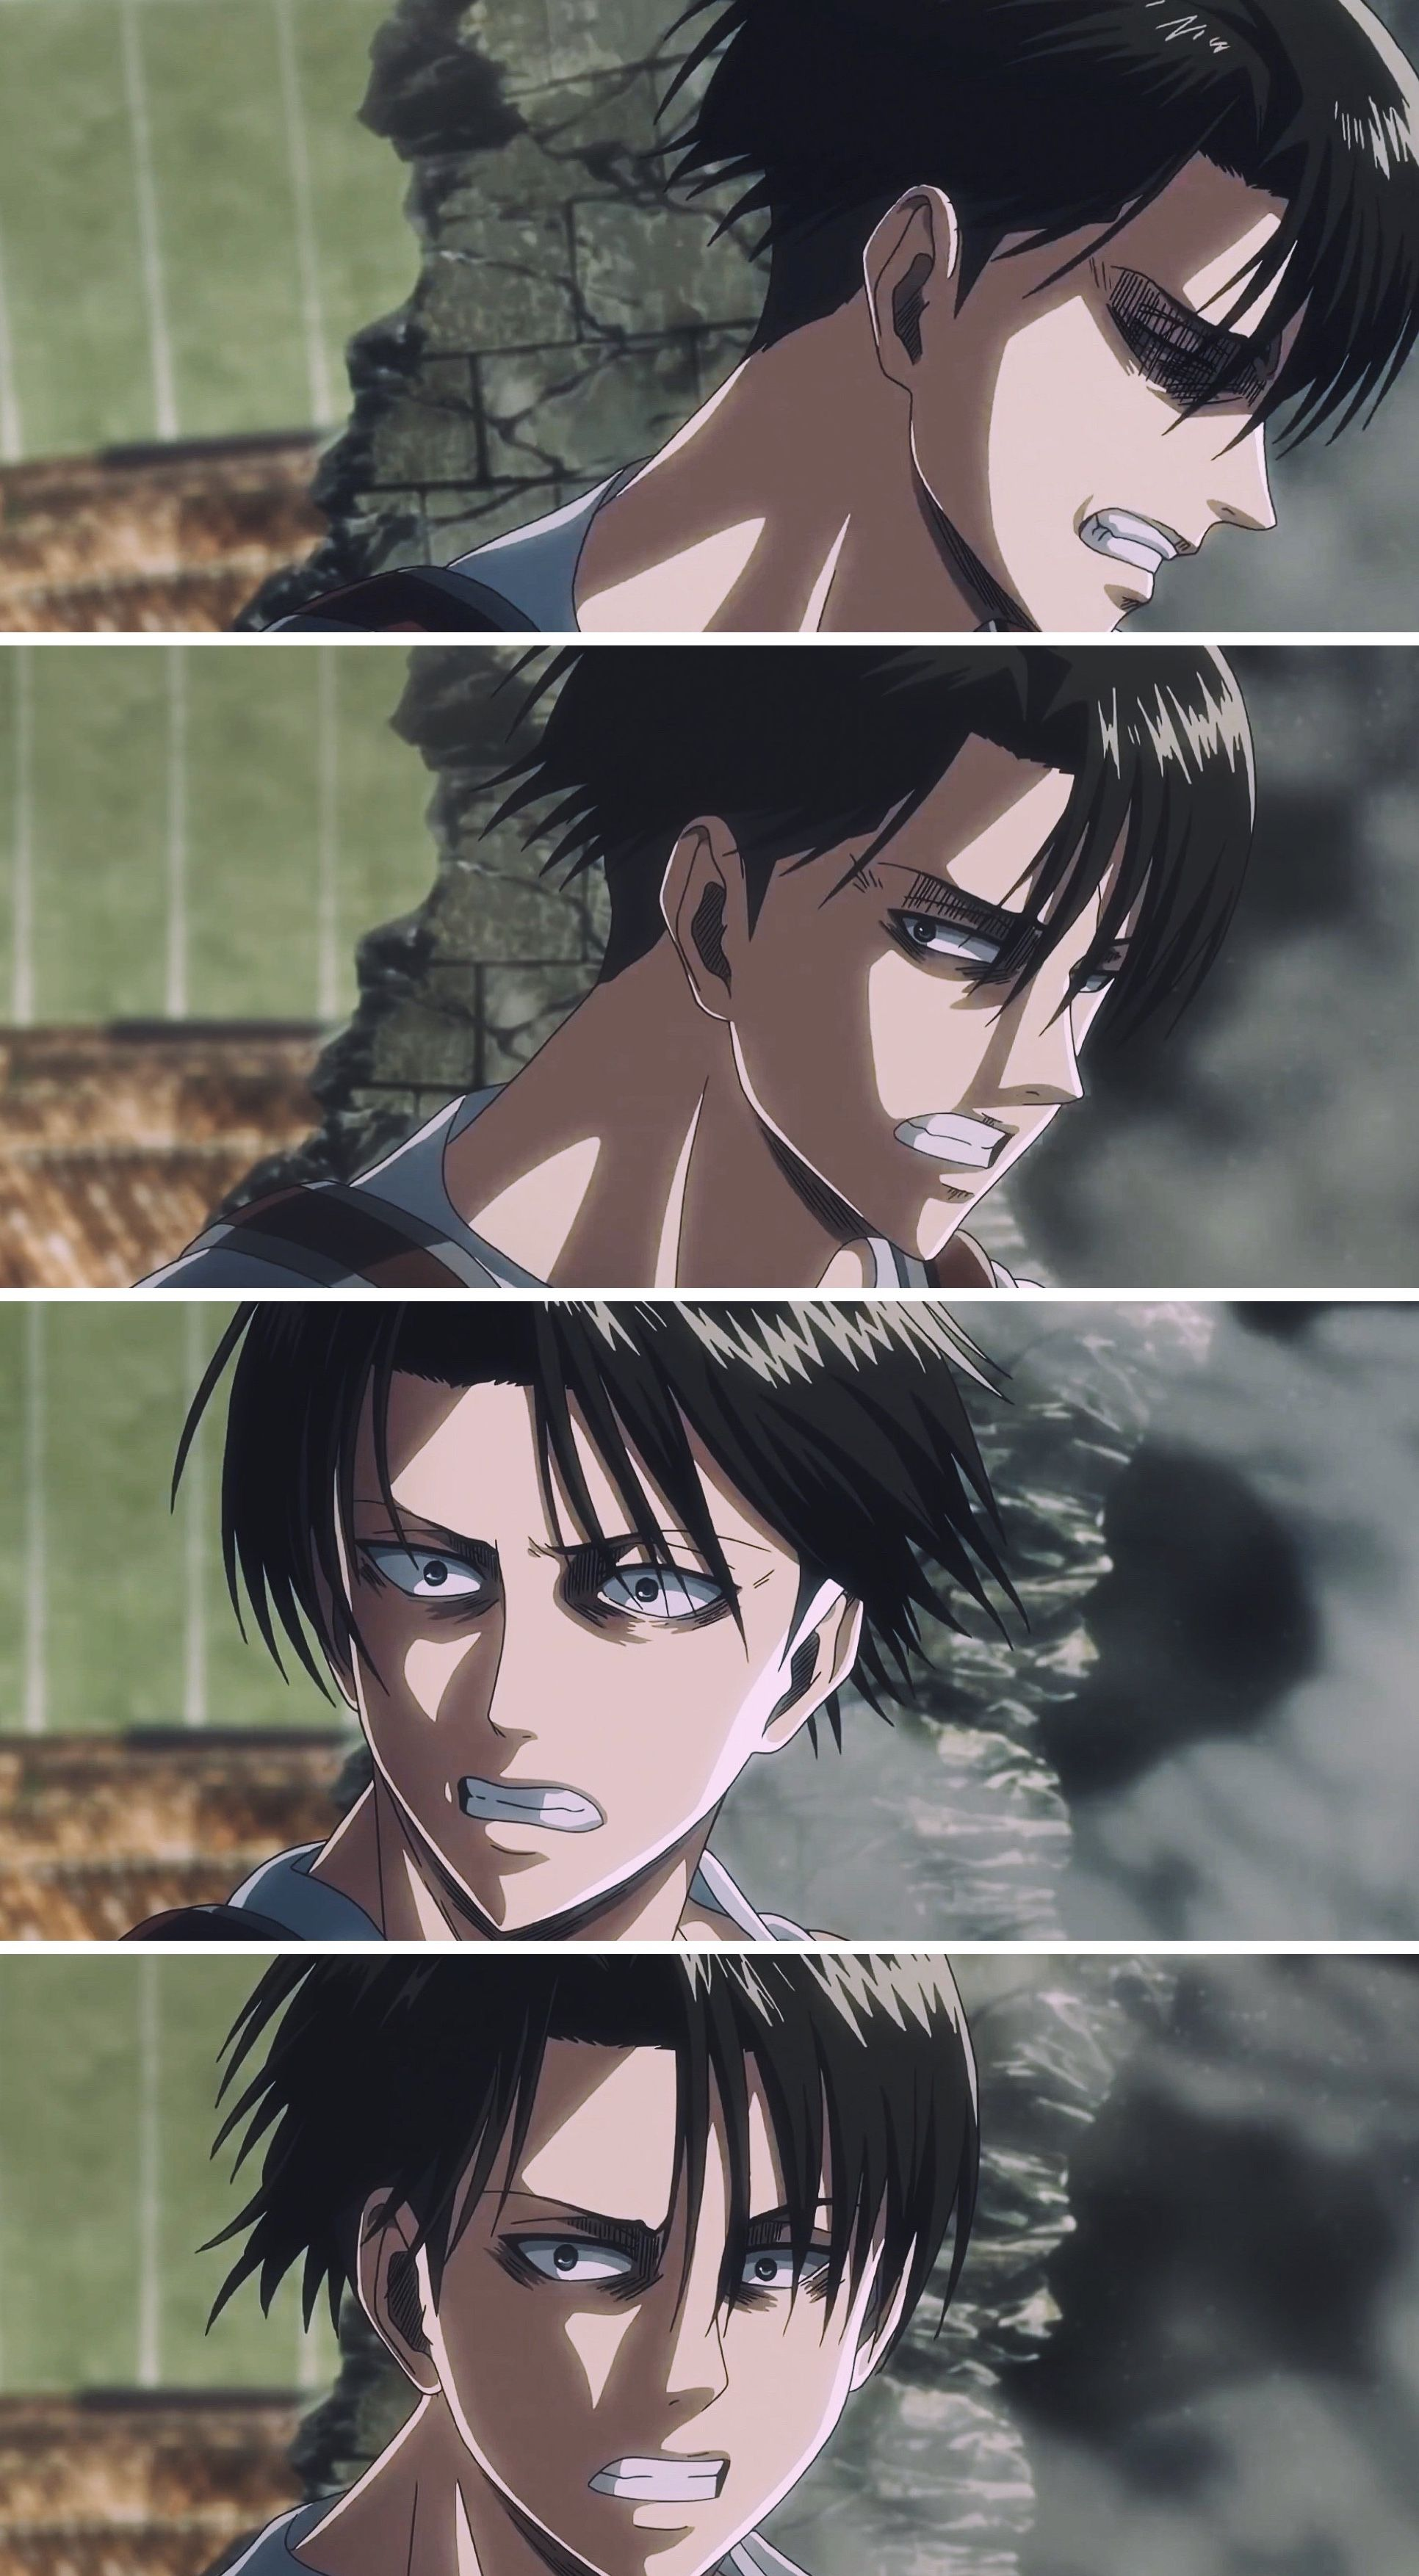 Levi Ackerman Attack On Titan Season Attack On Titan Anime Attack On Titan Art